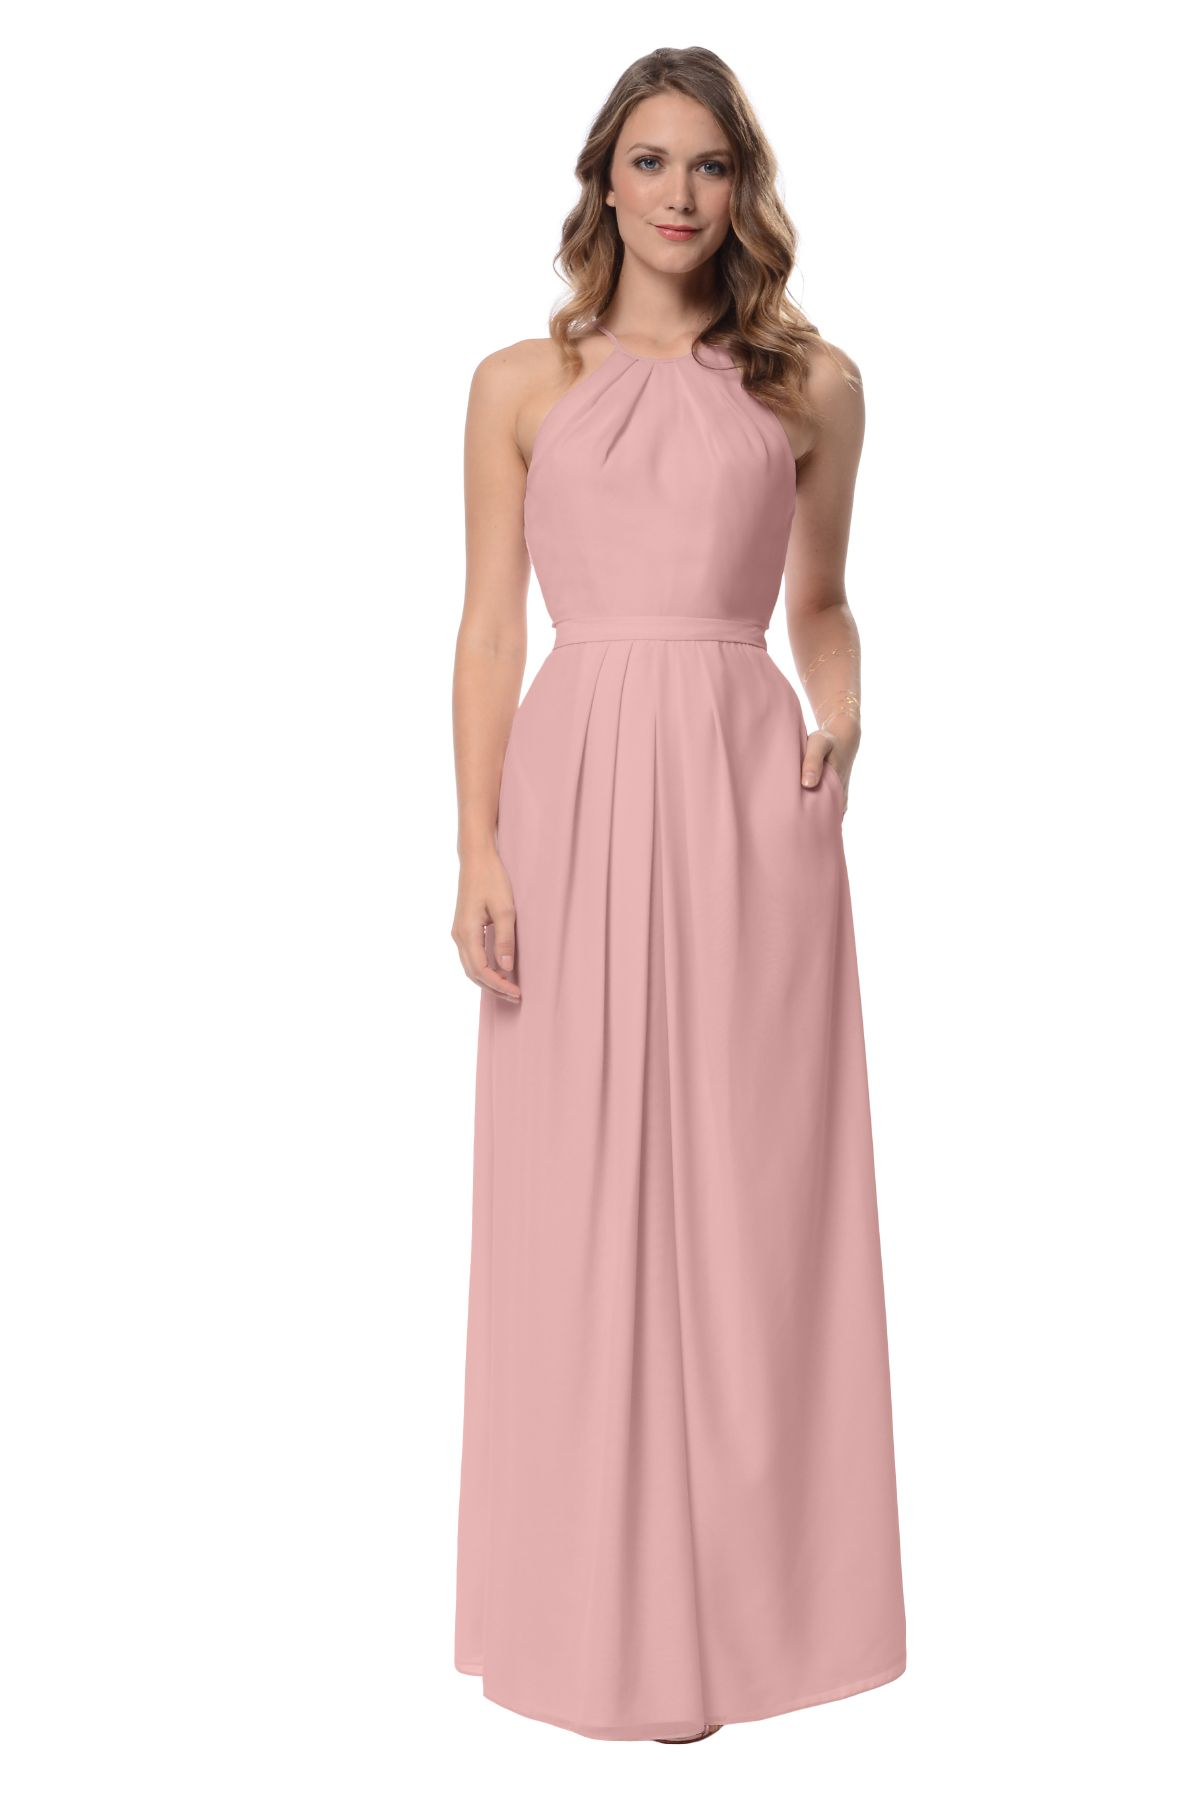 Dove Dahlia Isabelle Bridesmaid Dress Weddington Way Joanna